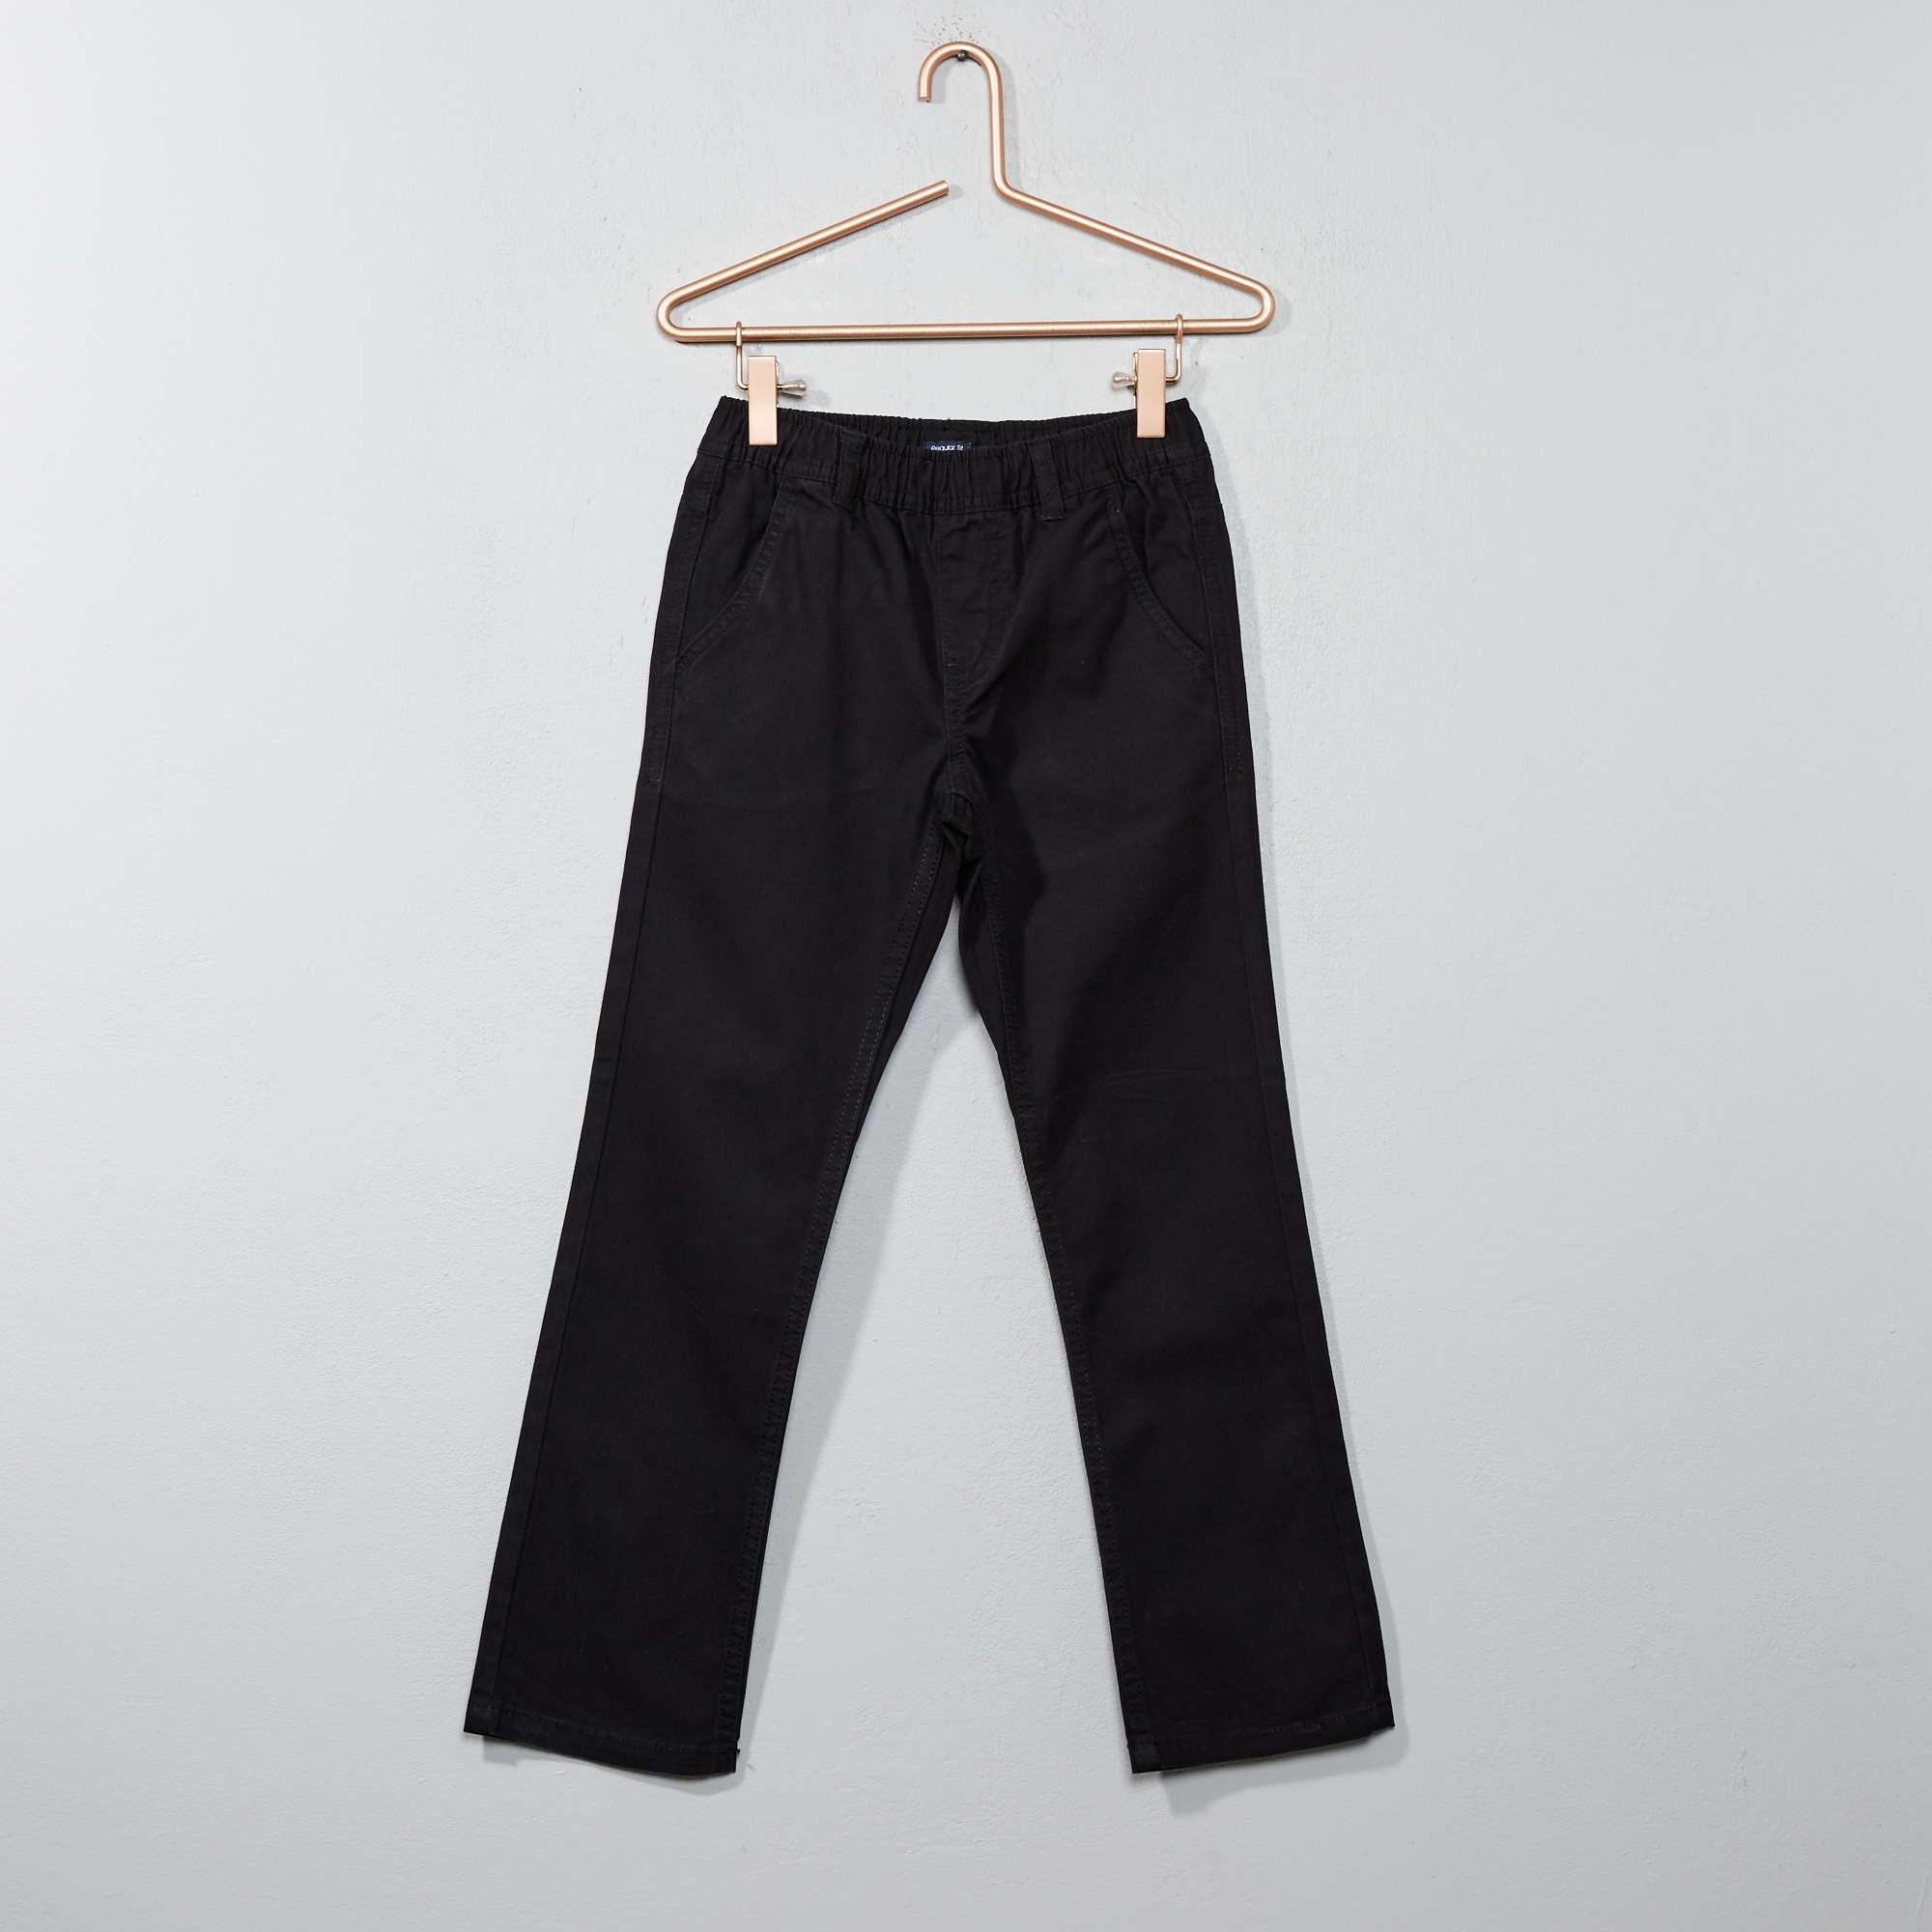 pantalon chino en canvas gar on noir kiabi 3 00. Black Bedroom Furniture Sets. Home Design Ideas